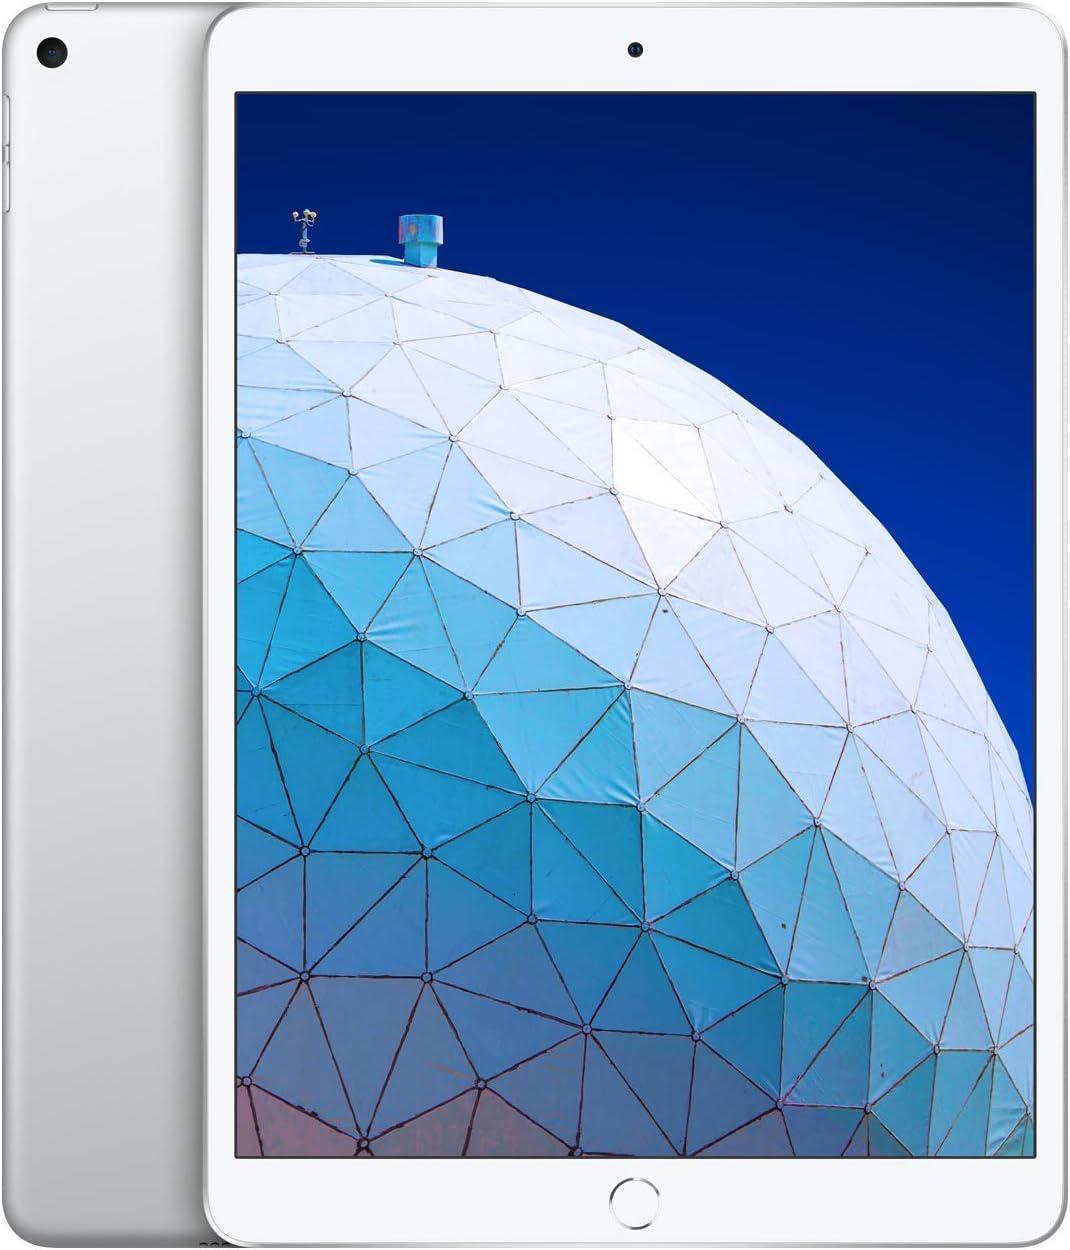 Apple Ipad Air 3 64gb Wi Fi Silber Computers Accessories